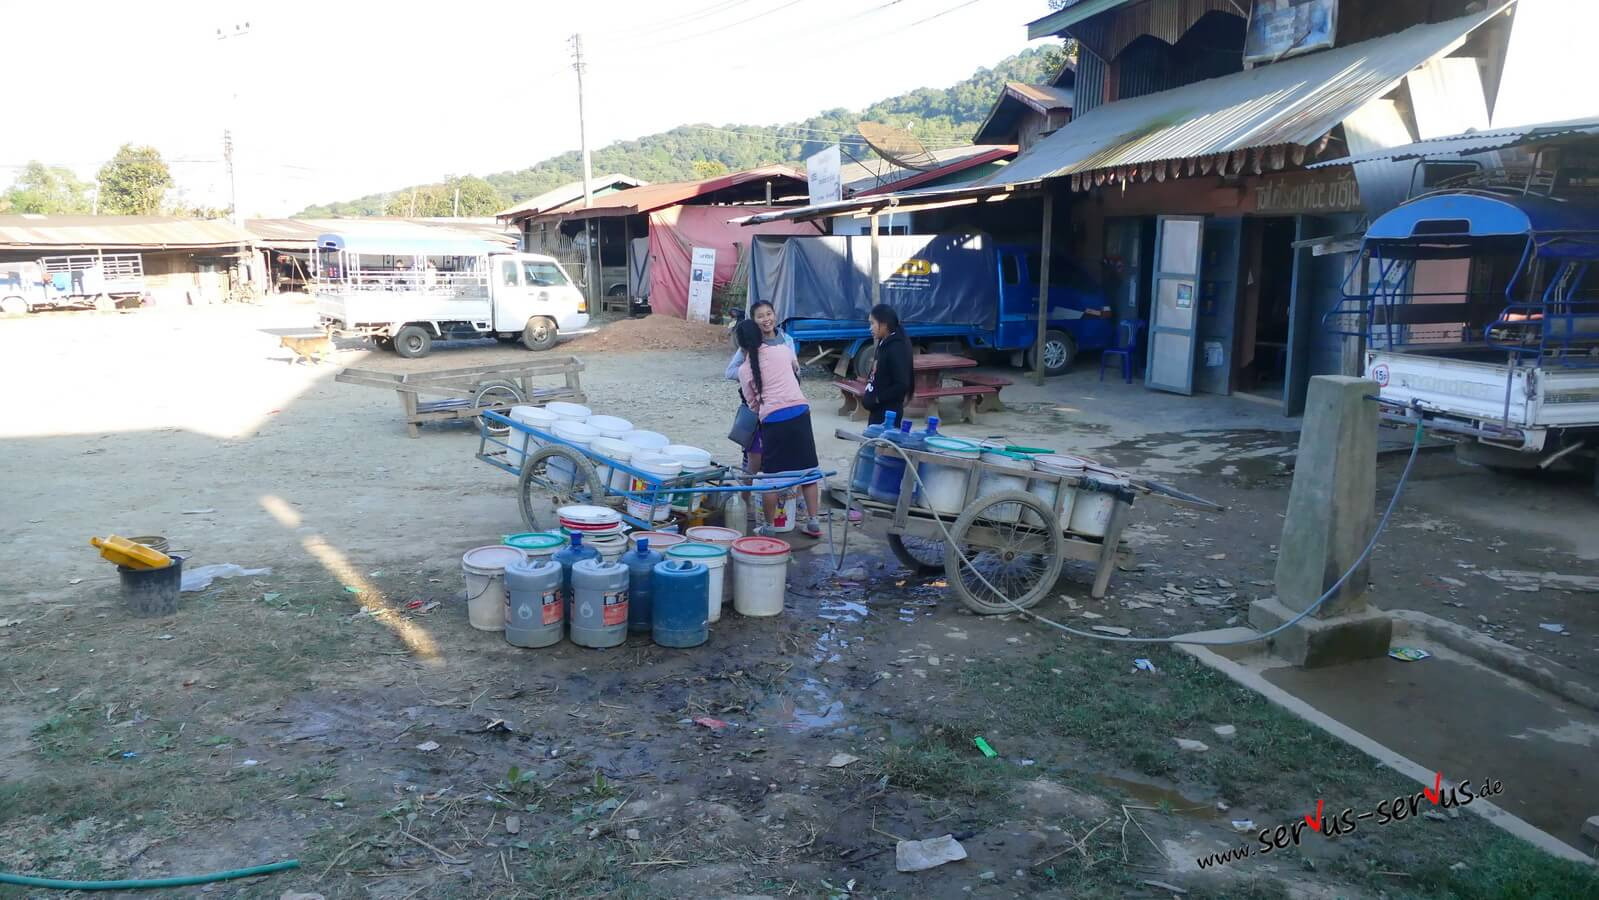 Brunnen-Pho Kham-Laos